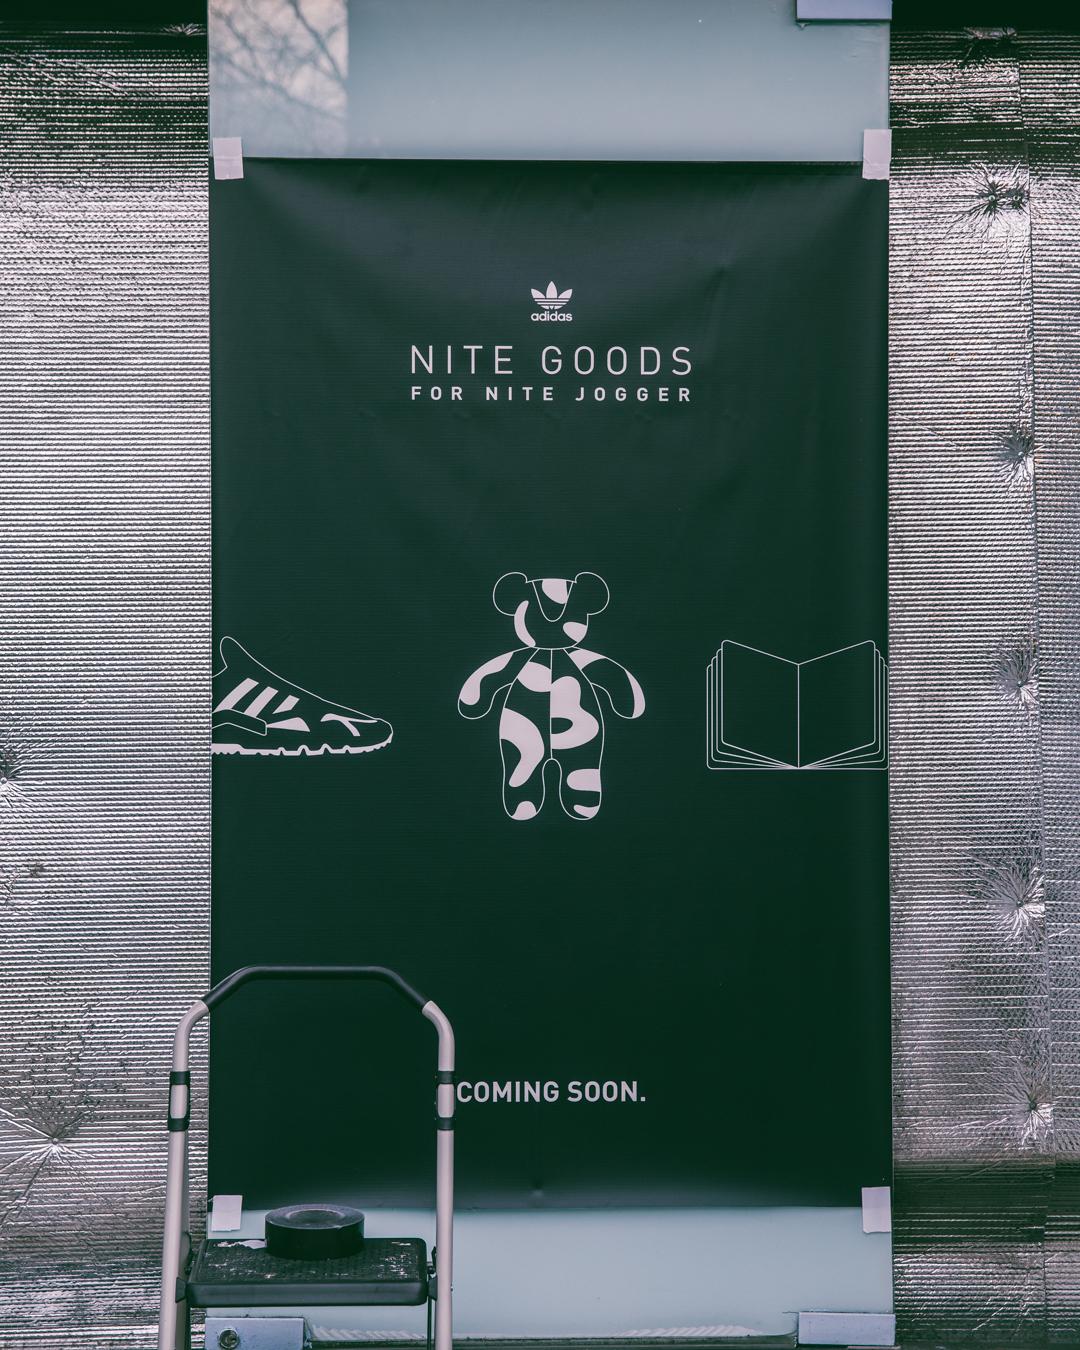 Nite_Goods_Wildpost_4.jpg